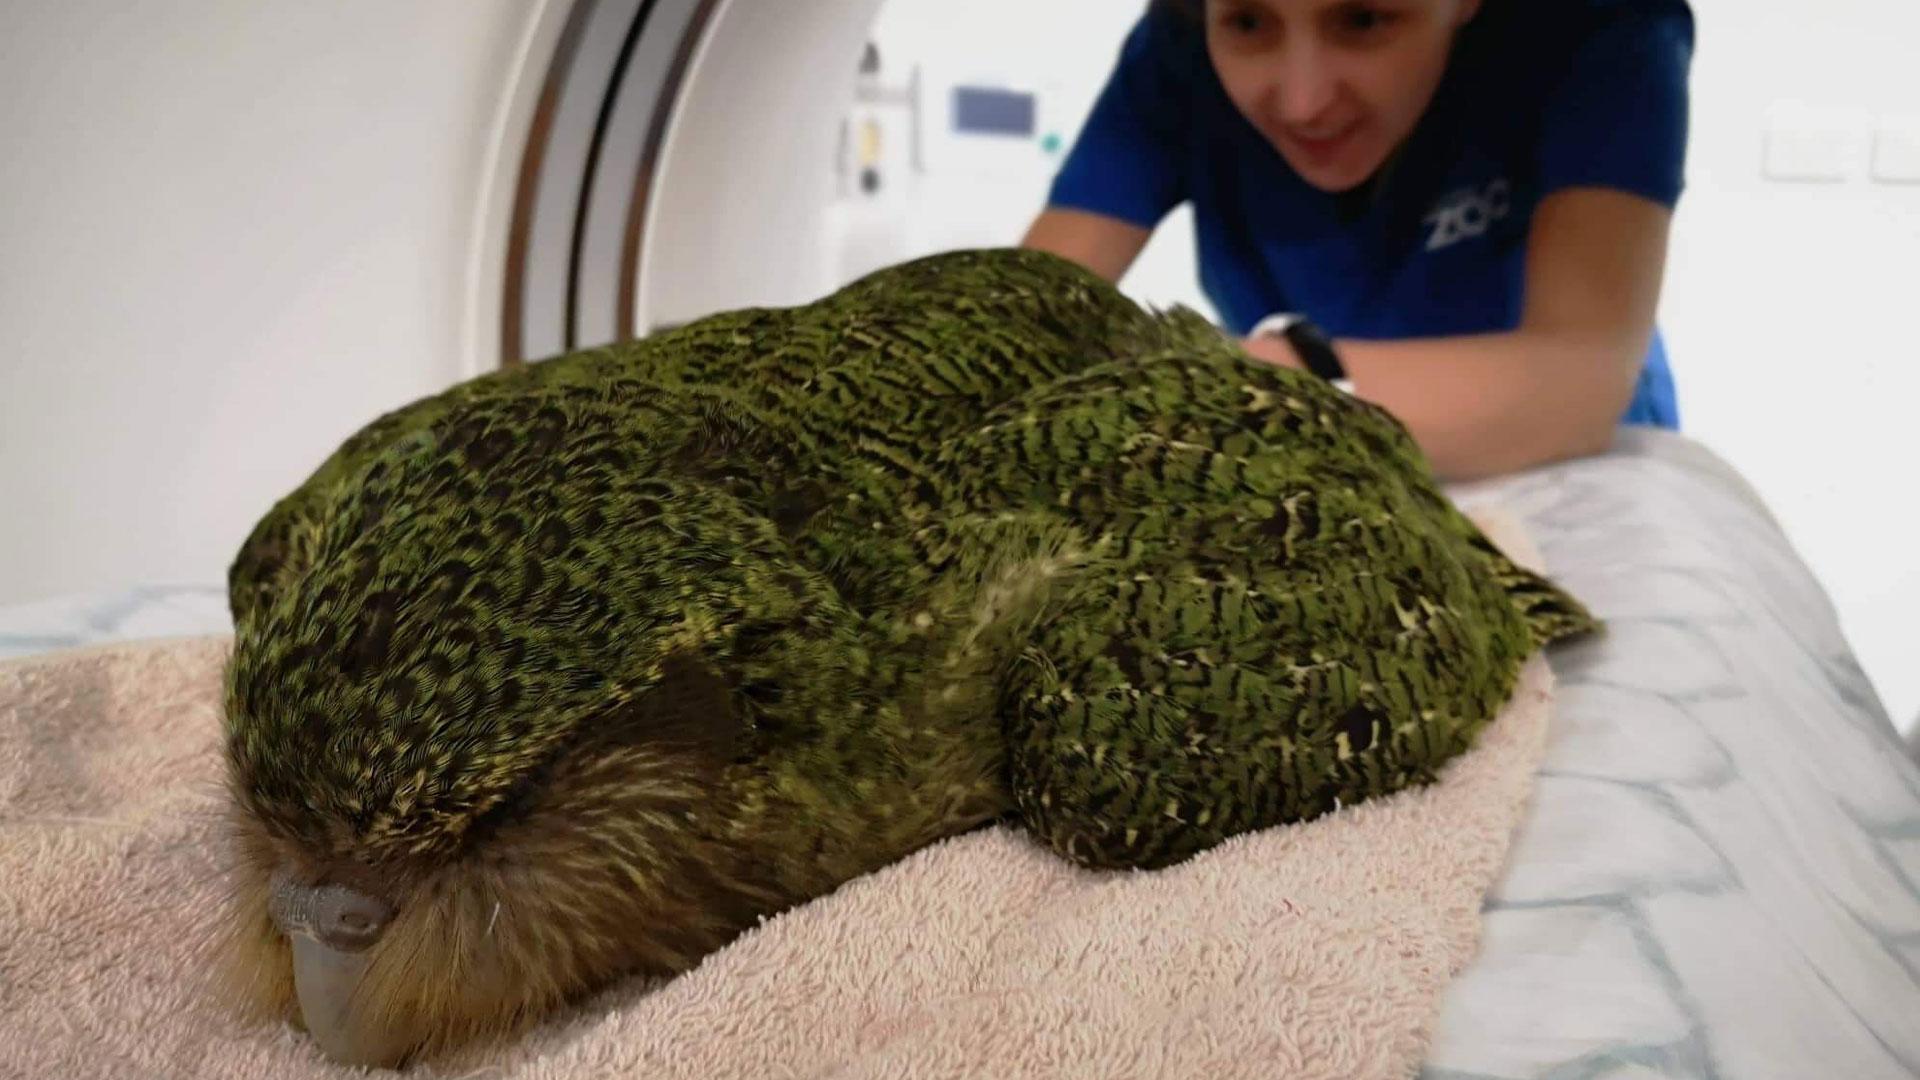 https://rfacdn.nz/zoo/assets/media/kakapo-gallery-5.jpg